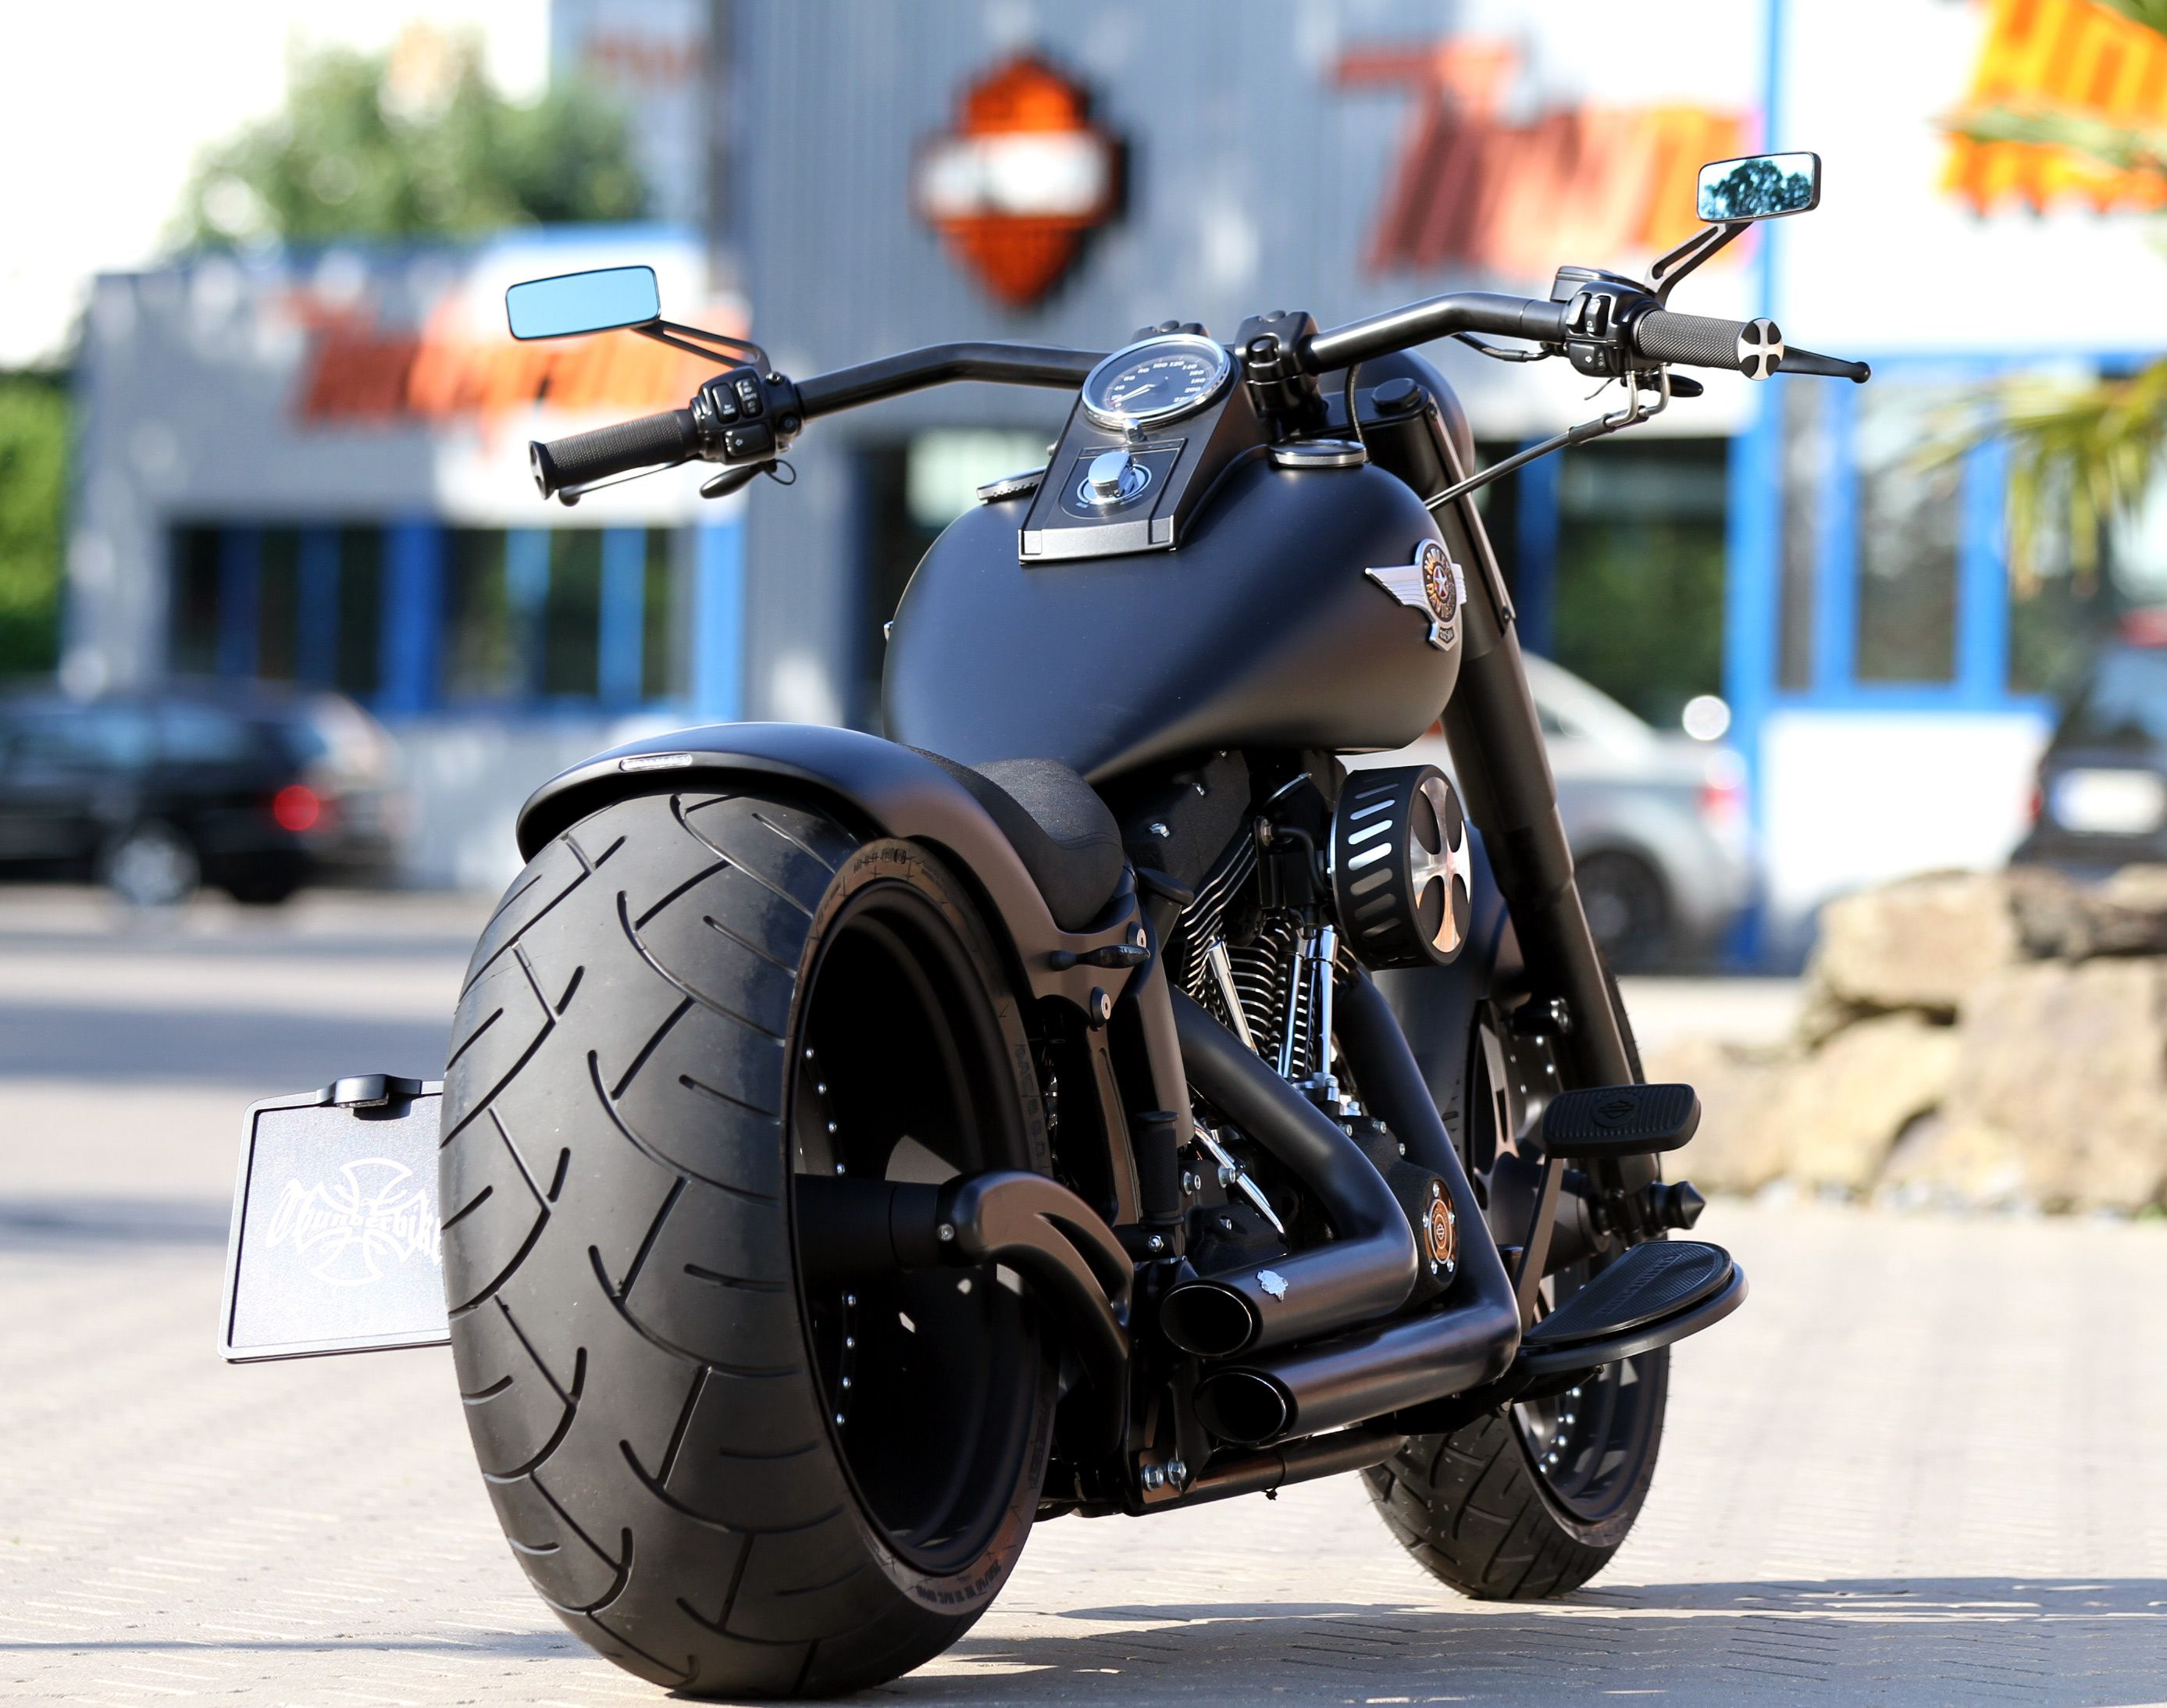 thunderbike customized harley davidson fat boy hot. Black Bedroom Furniture Sets. Home Design Ideas